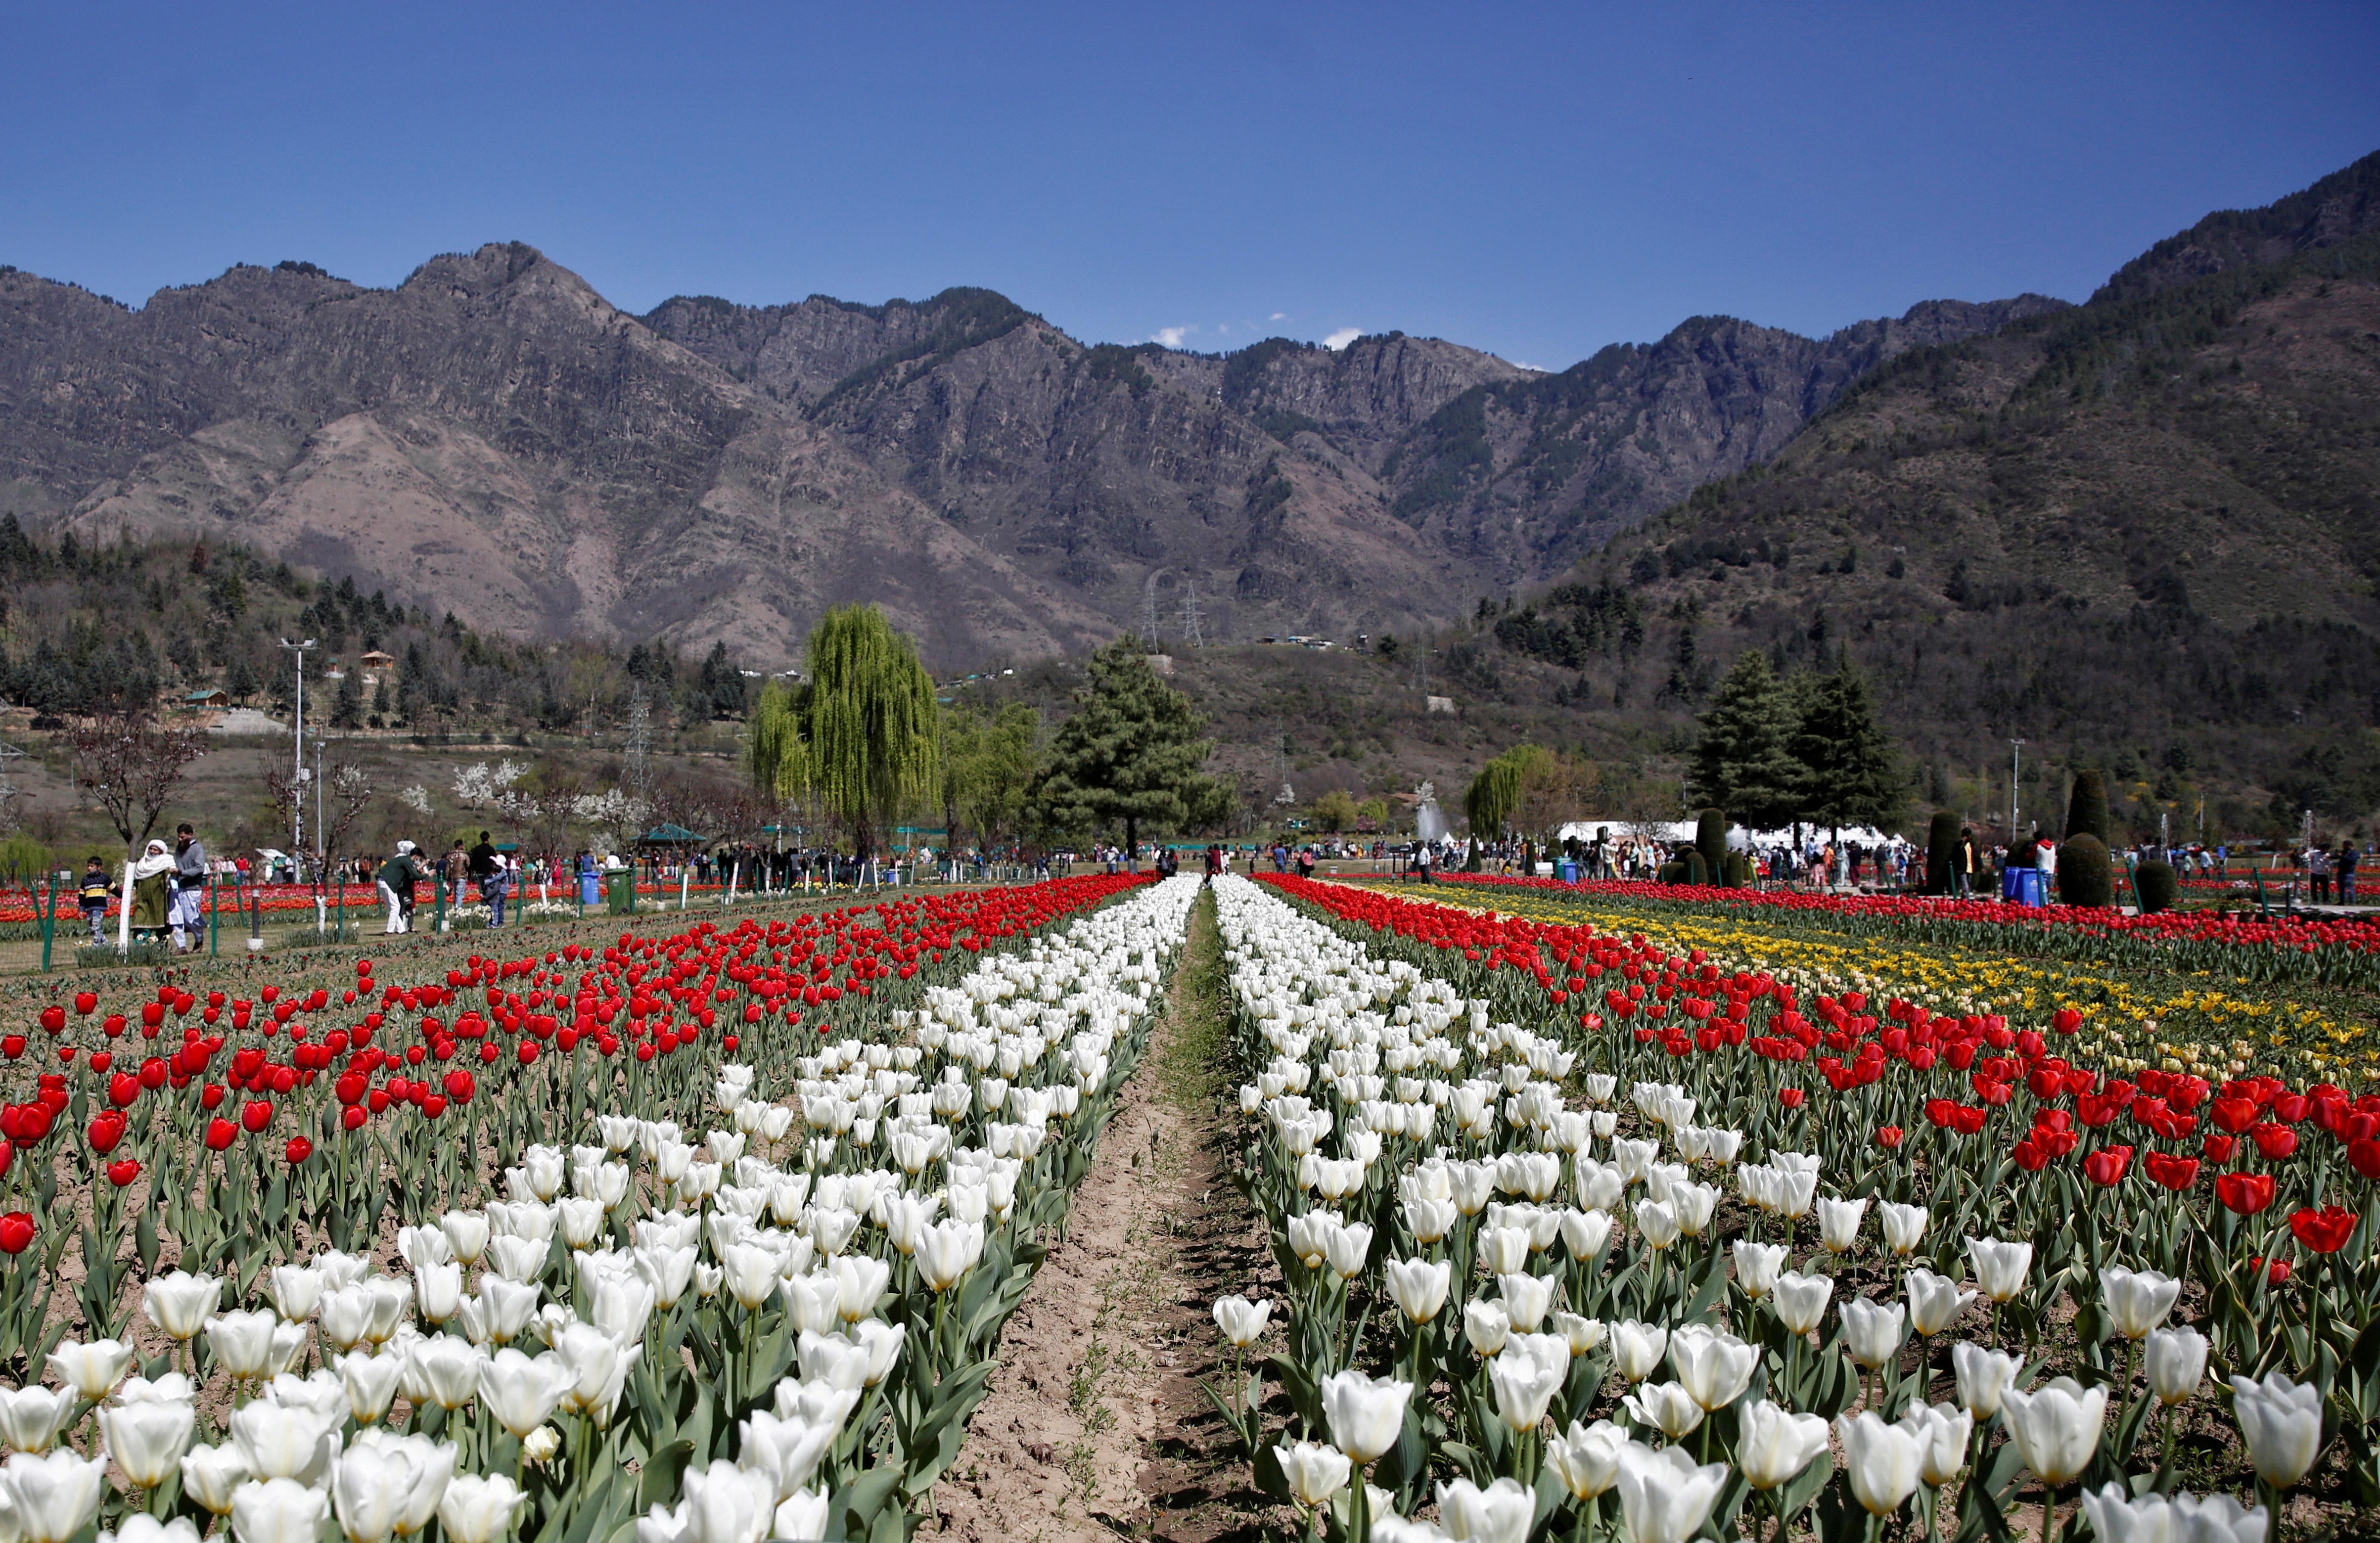 Visitors walk inside Kashmir's tulip garden on the foothills of Zabarwan mountain range in Srinagar April 2, 2021. REUTERS/Danish Ismail/File Photo